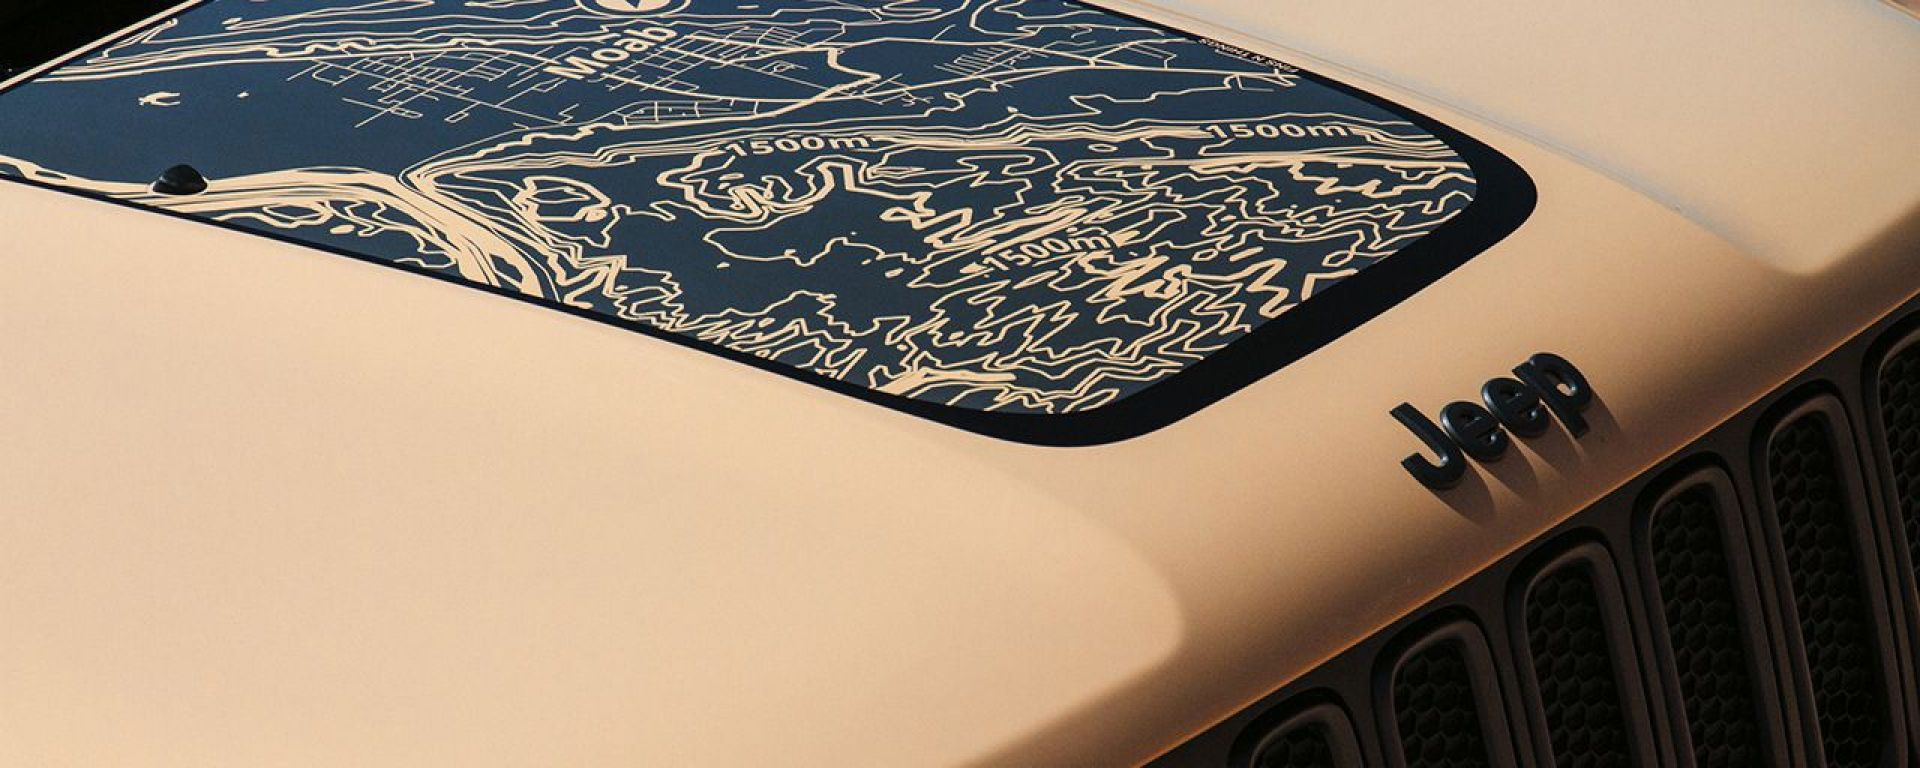 Jeep Renegade Desert Hawk: una Renegade nata sulle dune